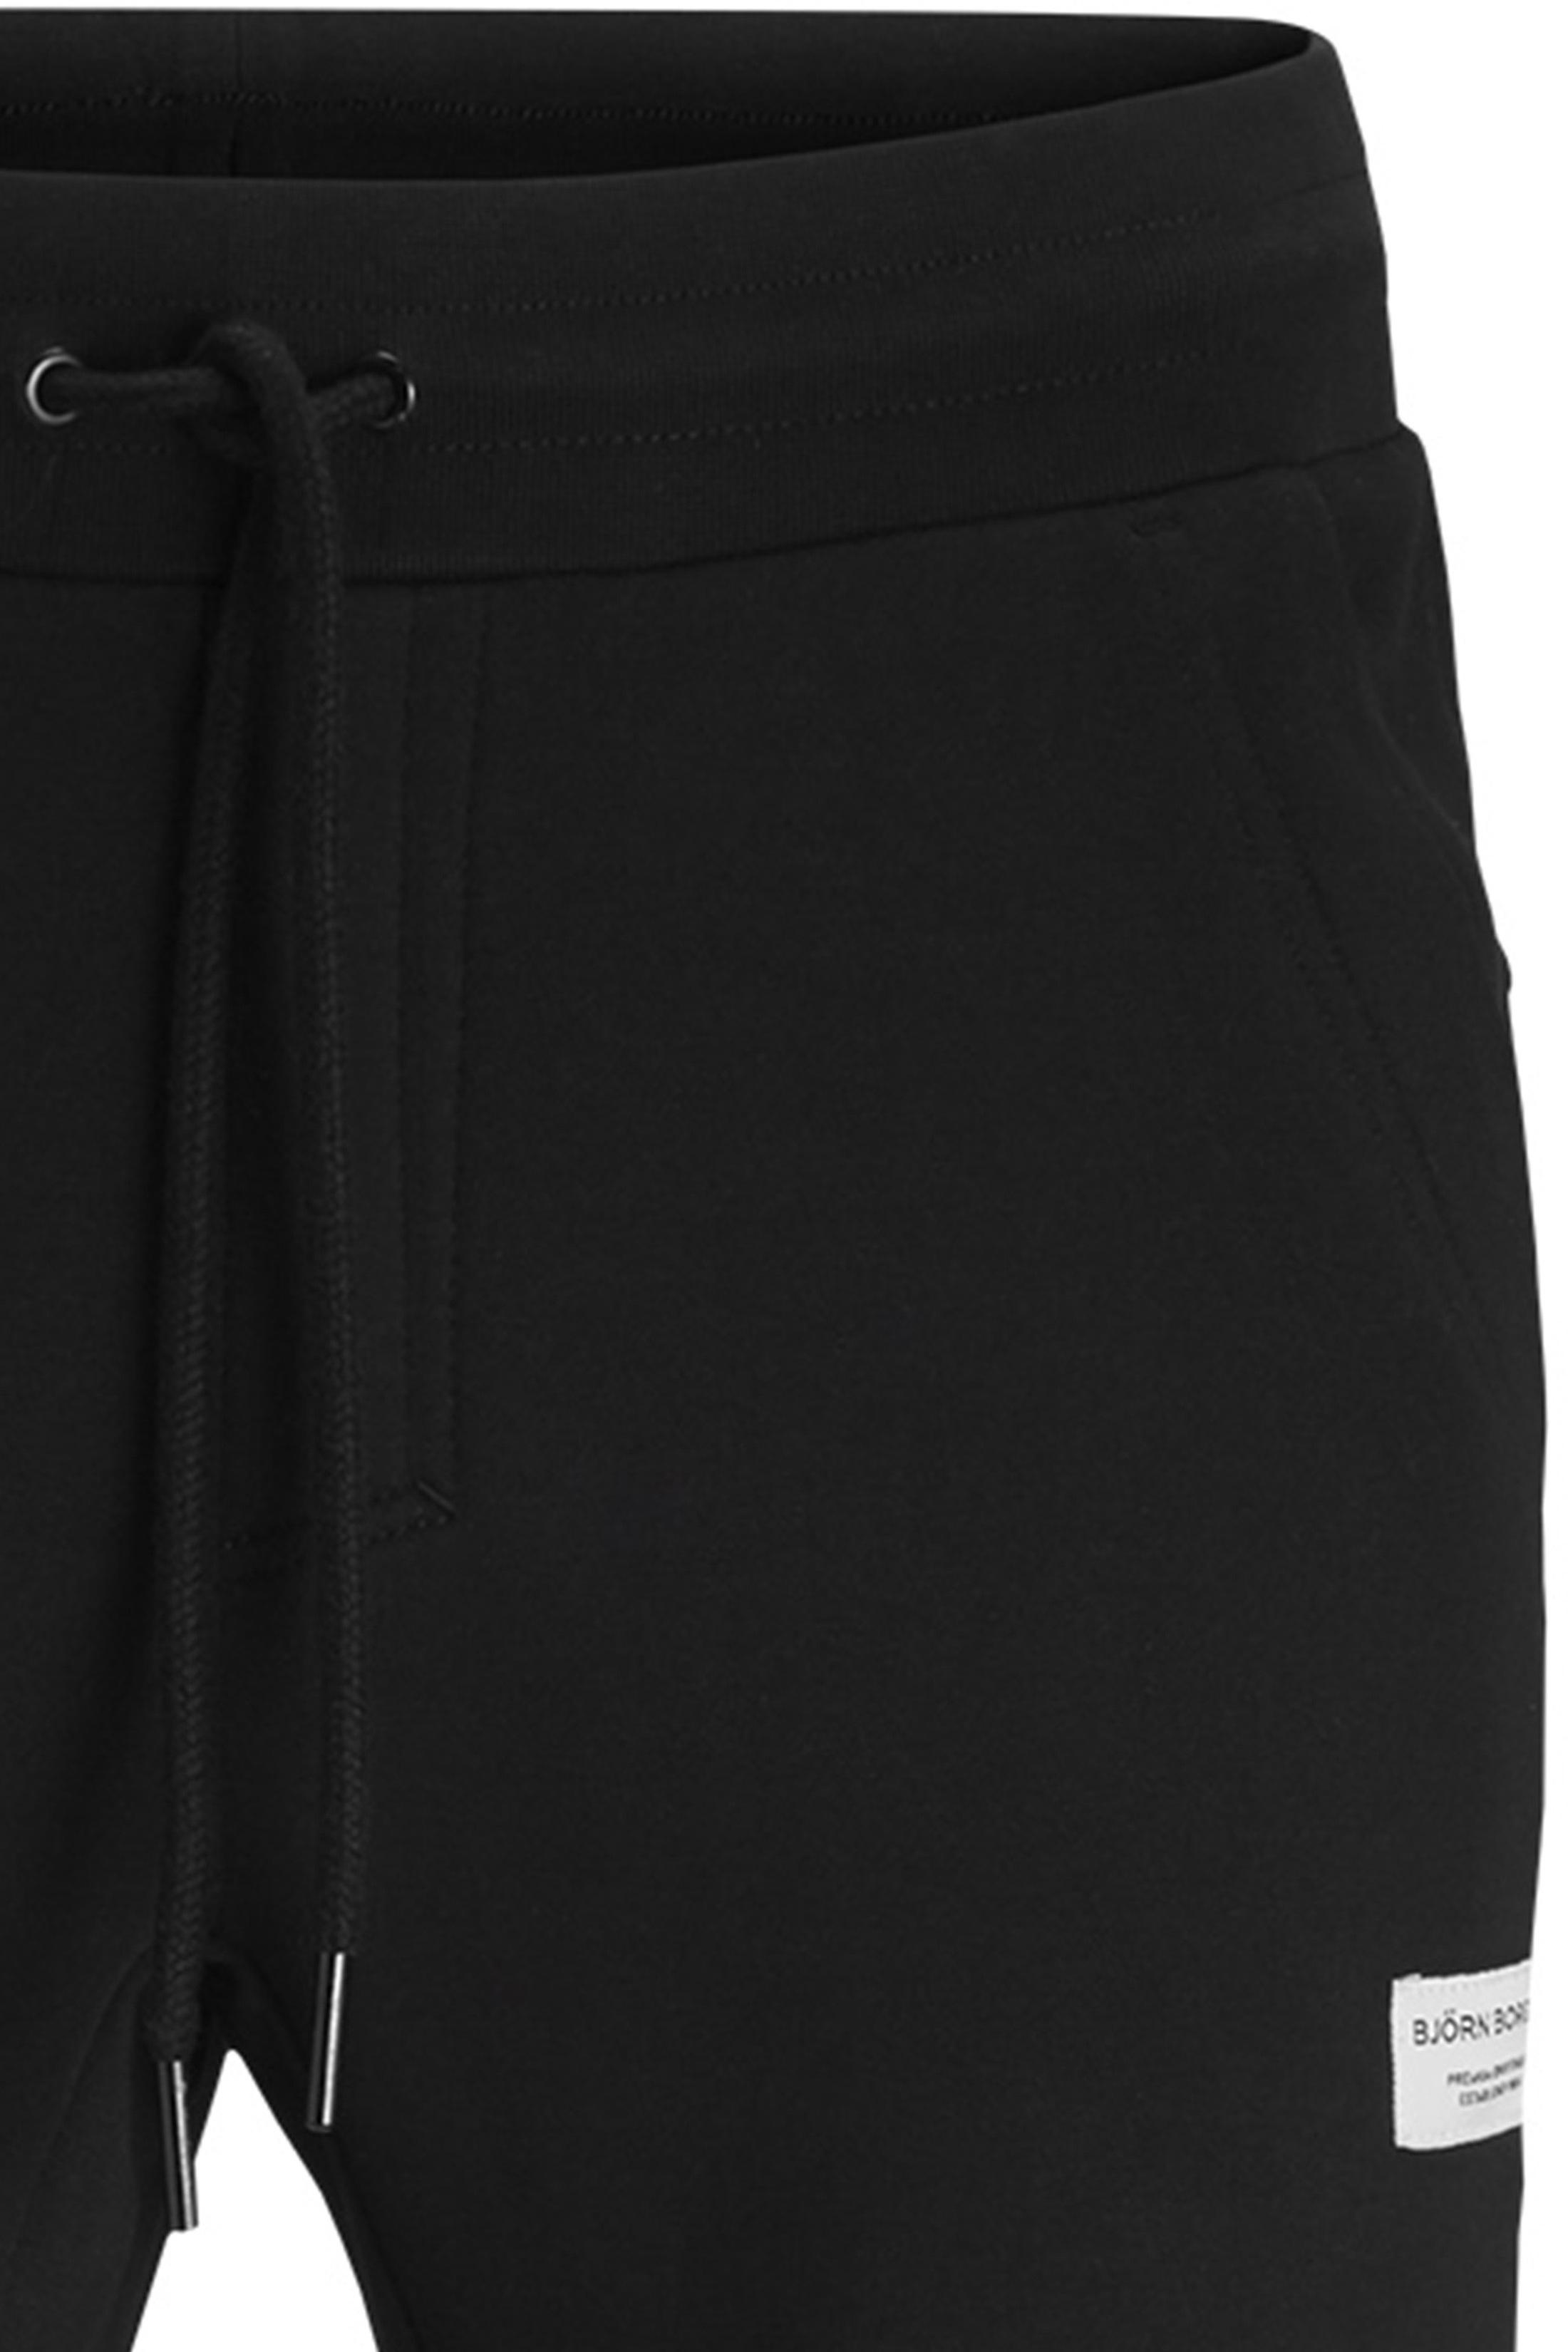 Bjorn Borg Sweatpants Black Beauty foto 1